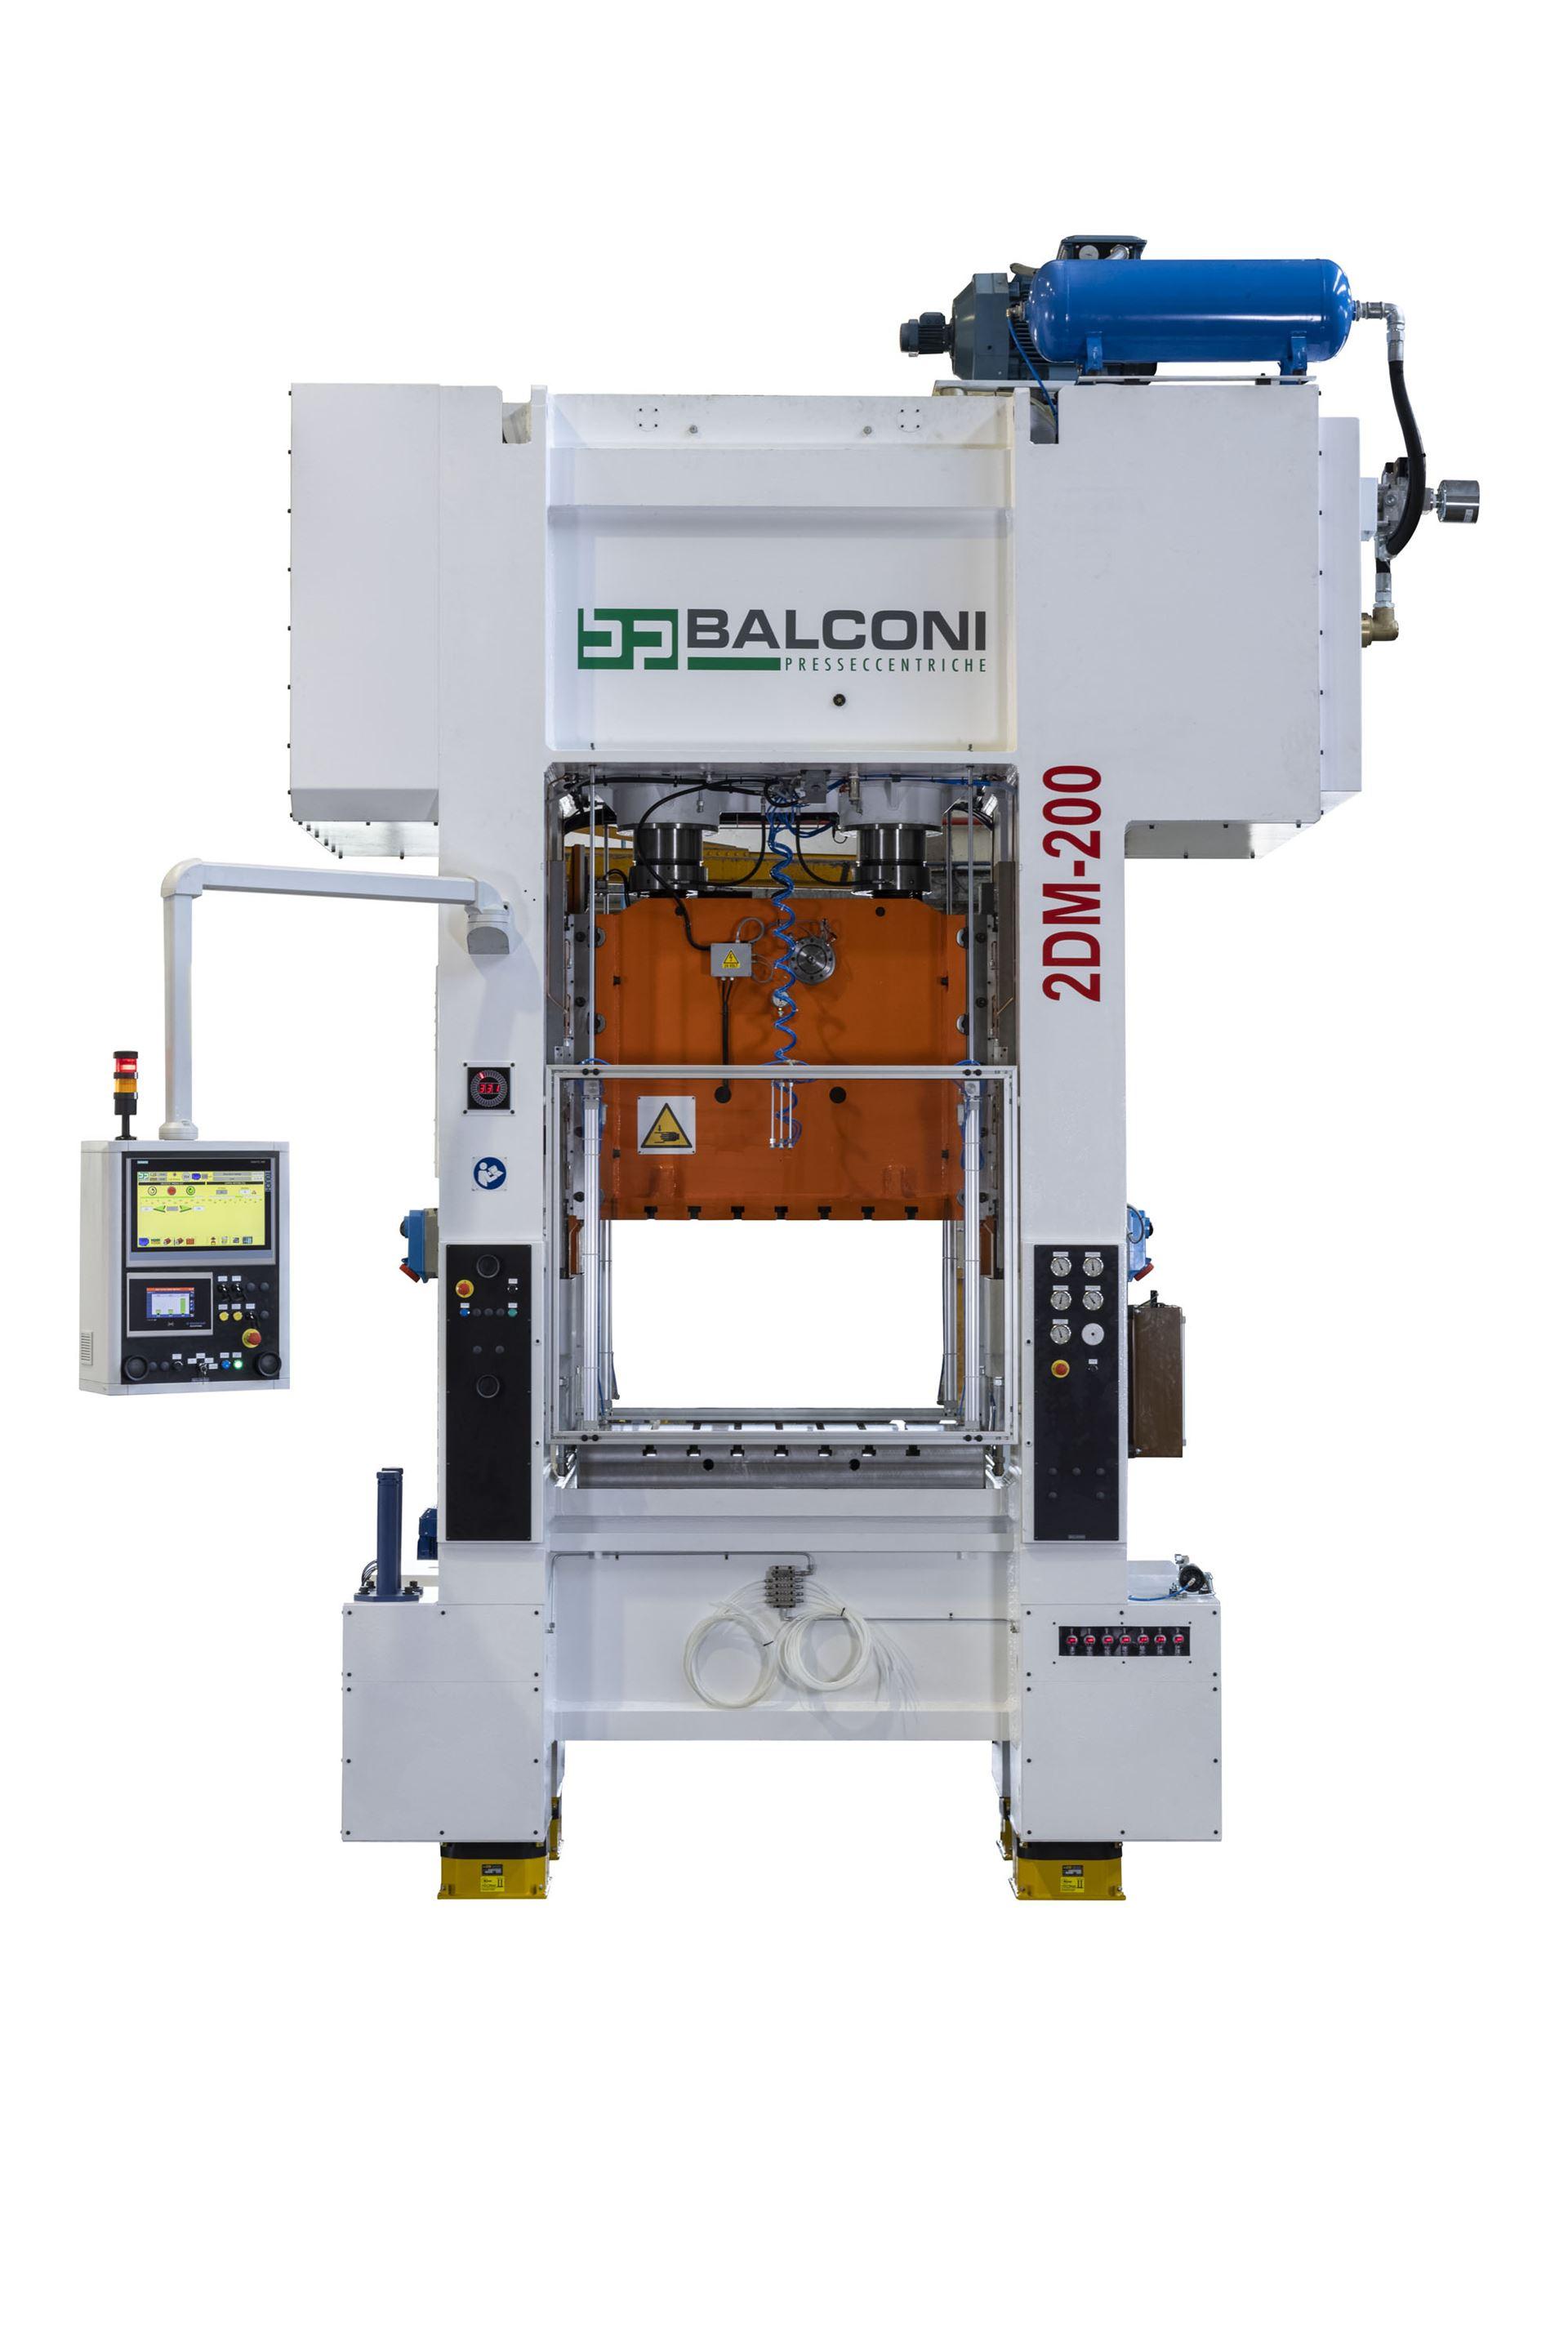 BALCONI-STANZPRESSE MODELL 2DM-200